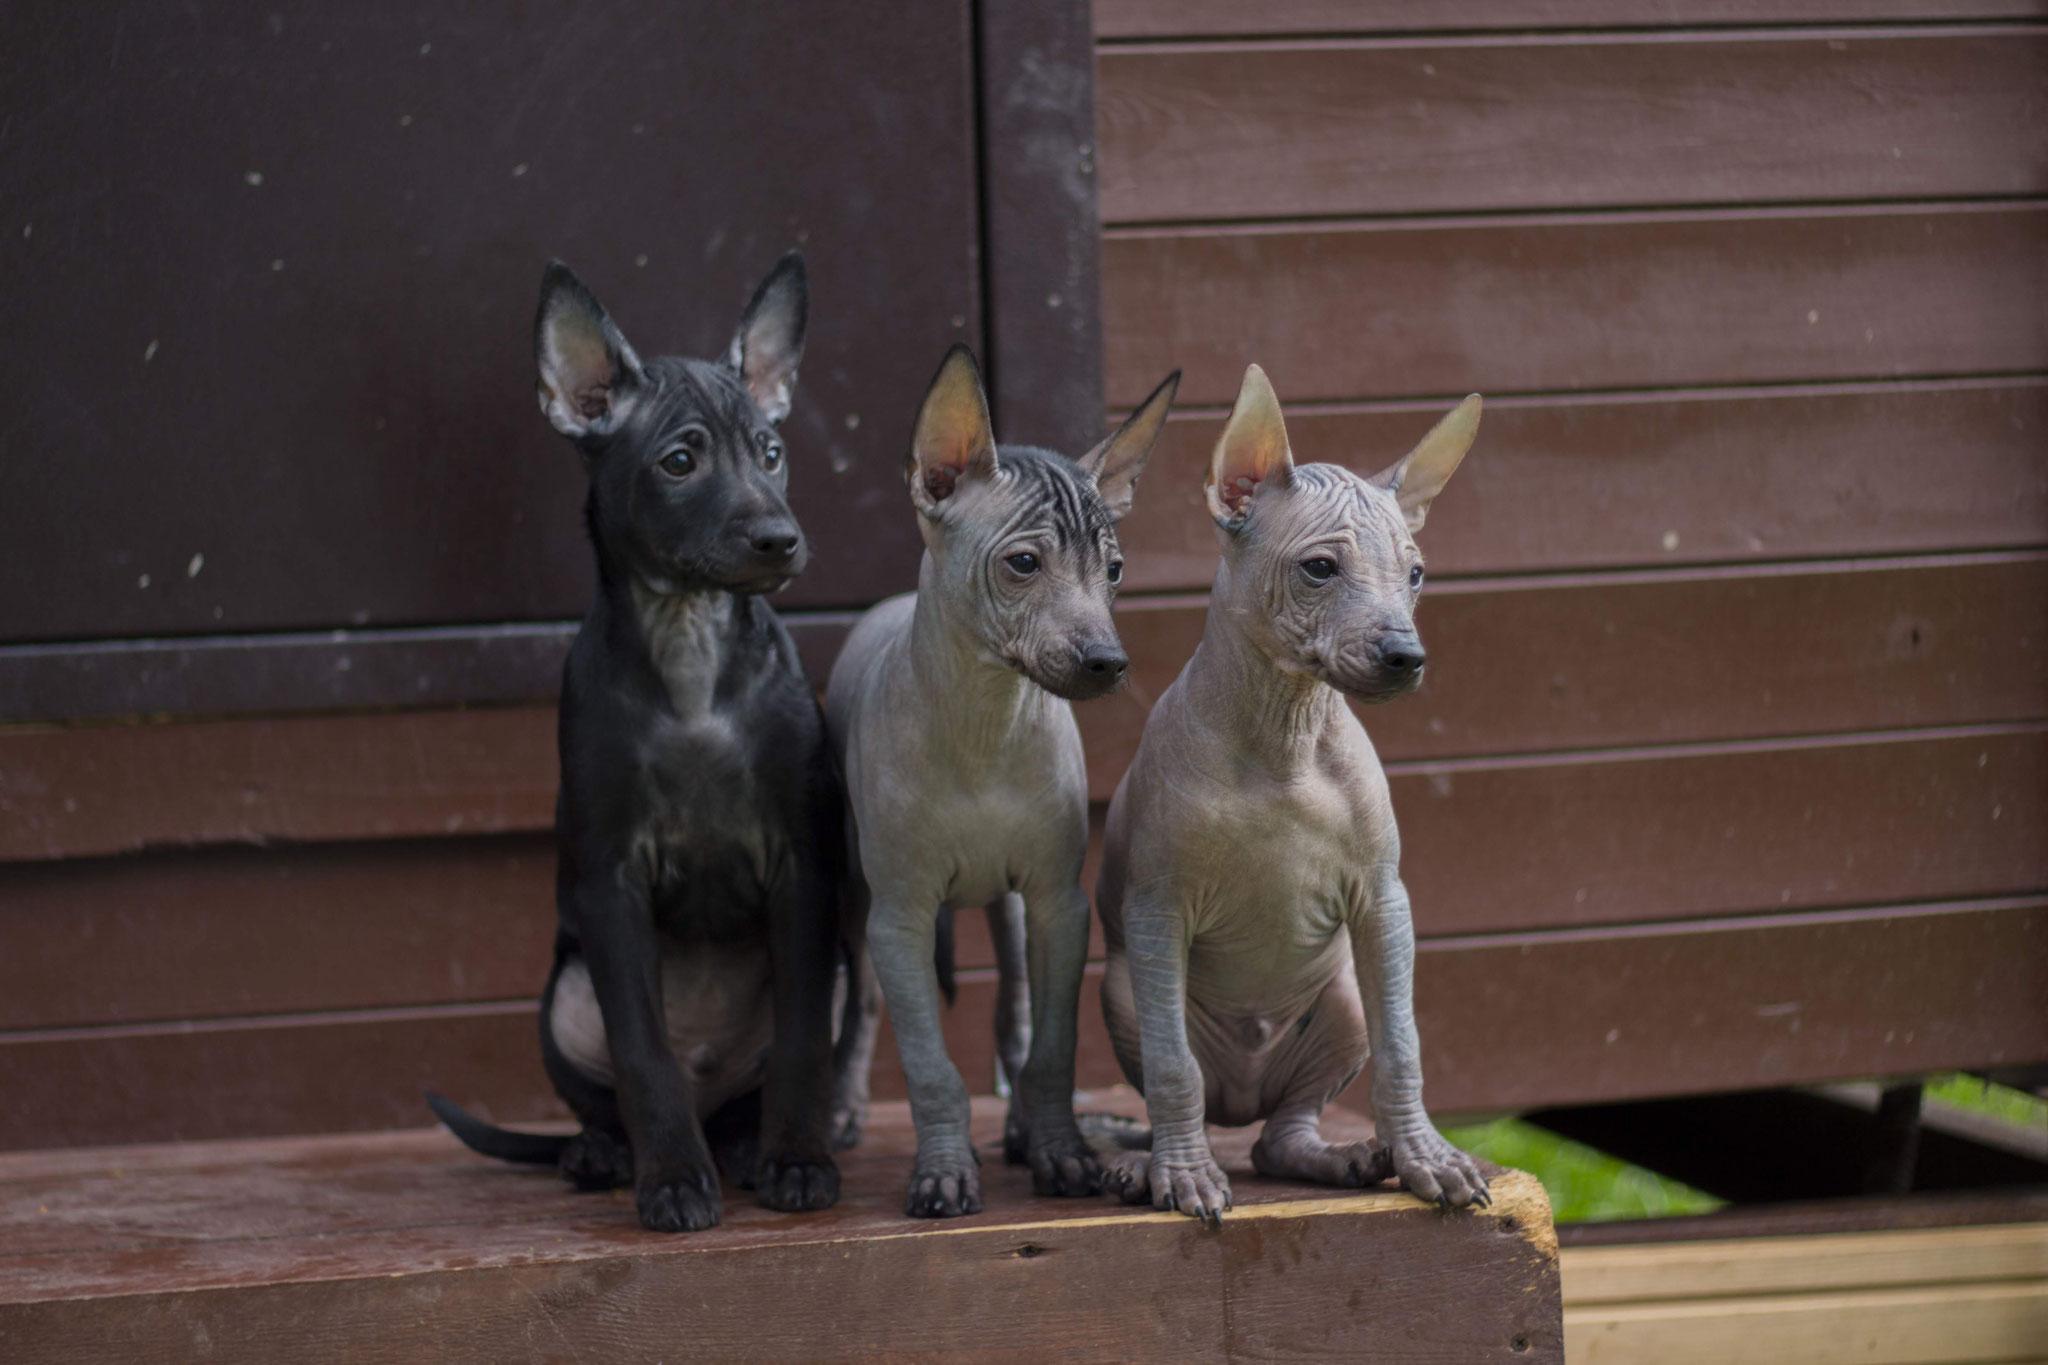 xolo puppies, intermediate and miniature sizes.